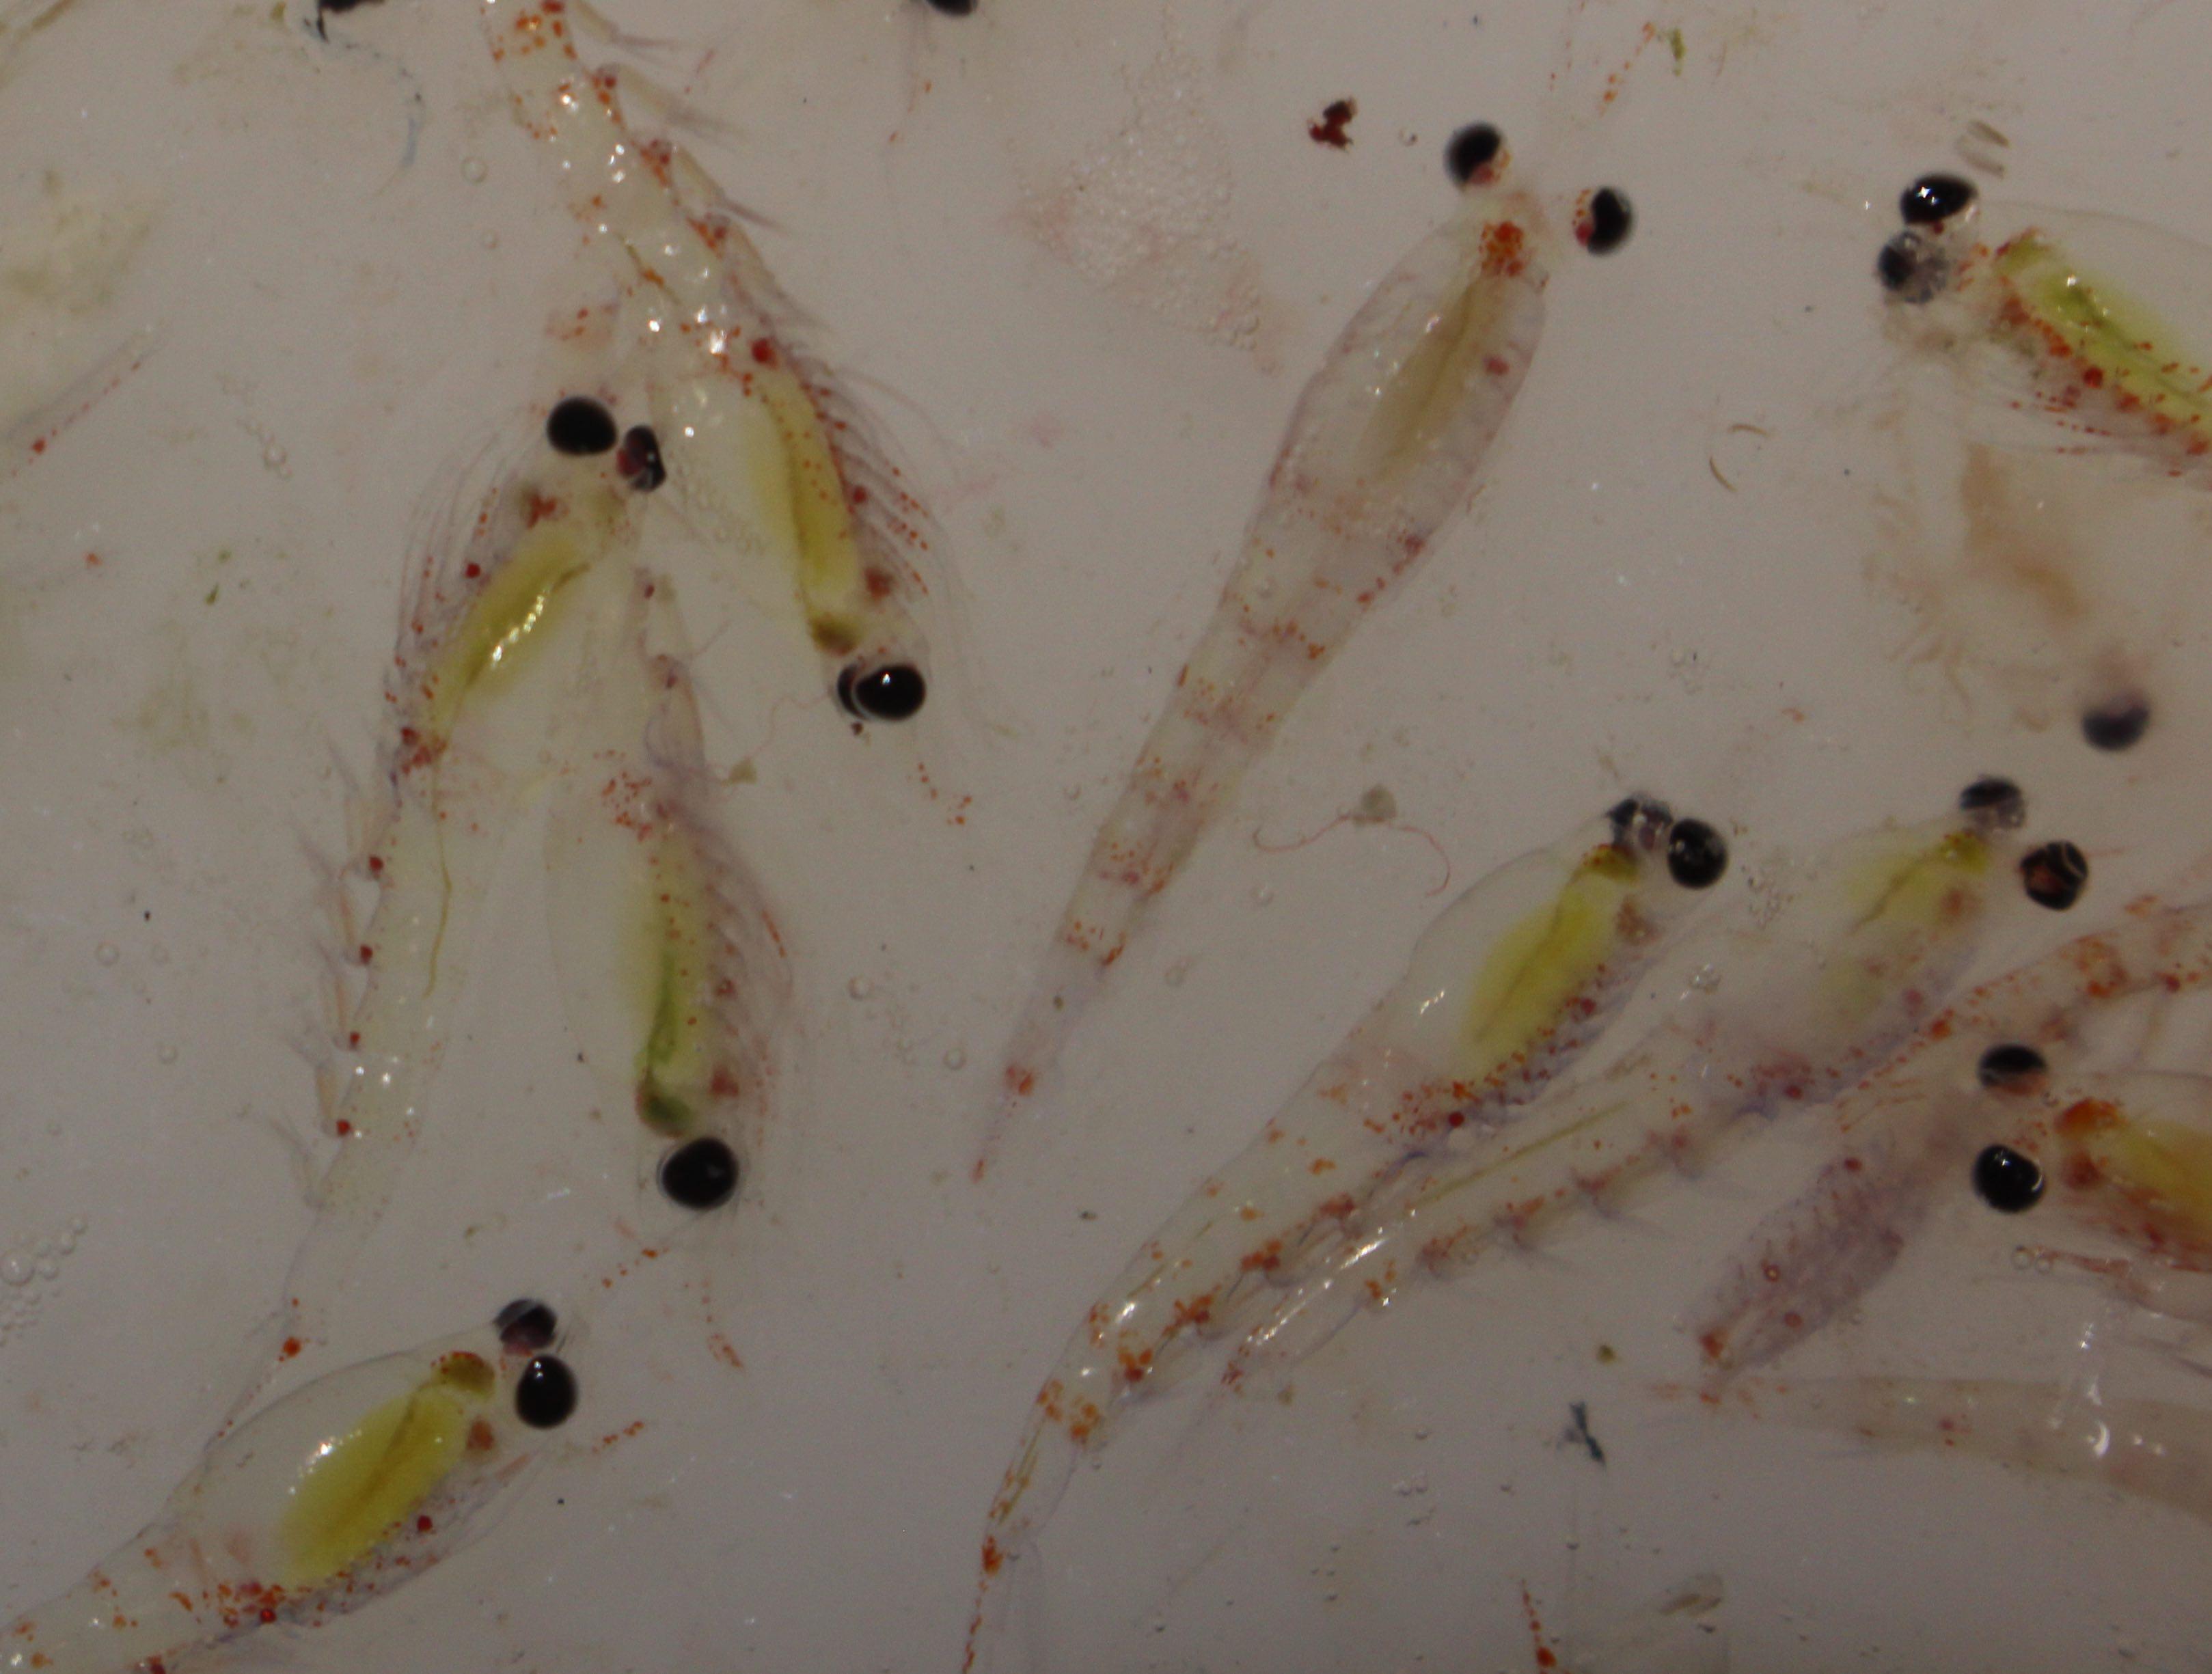 Thysanoessa inermis, a species of krill